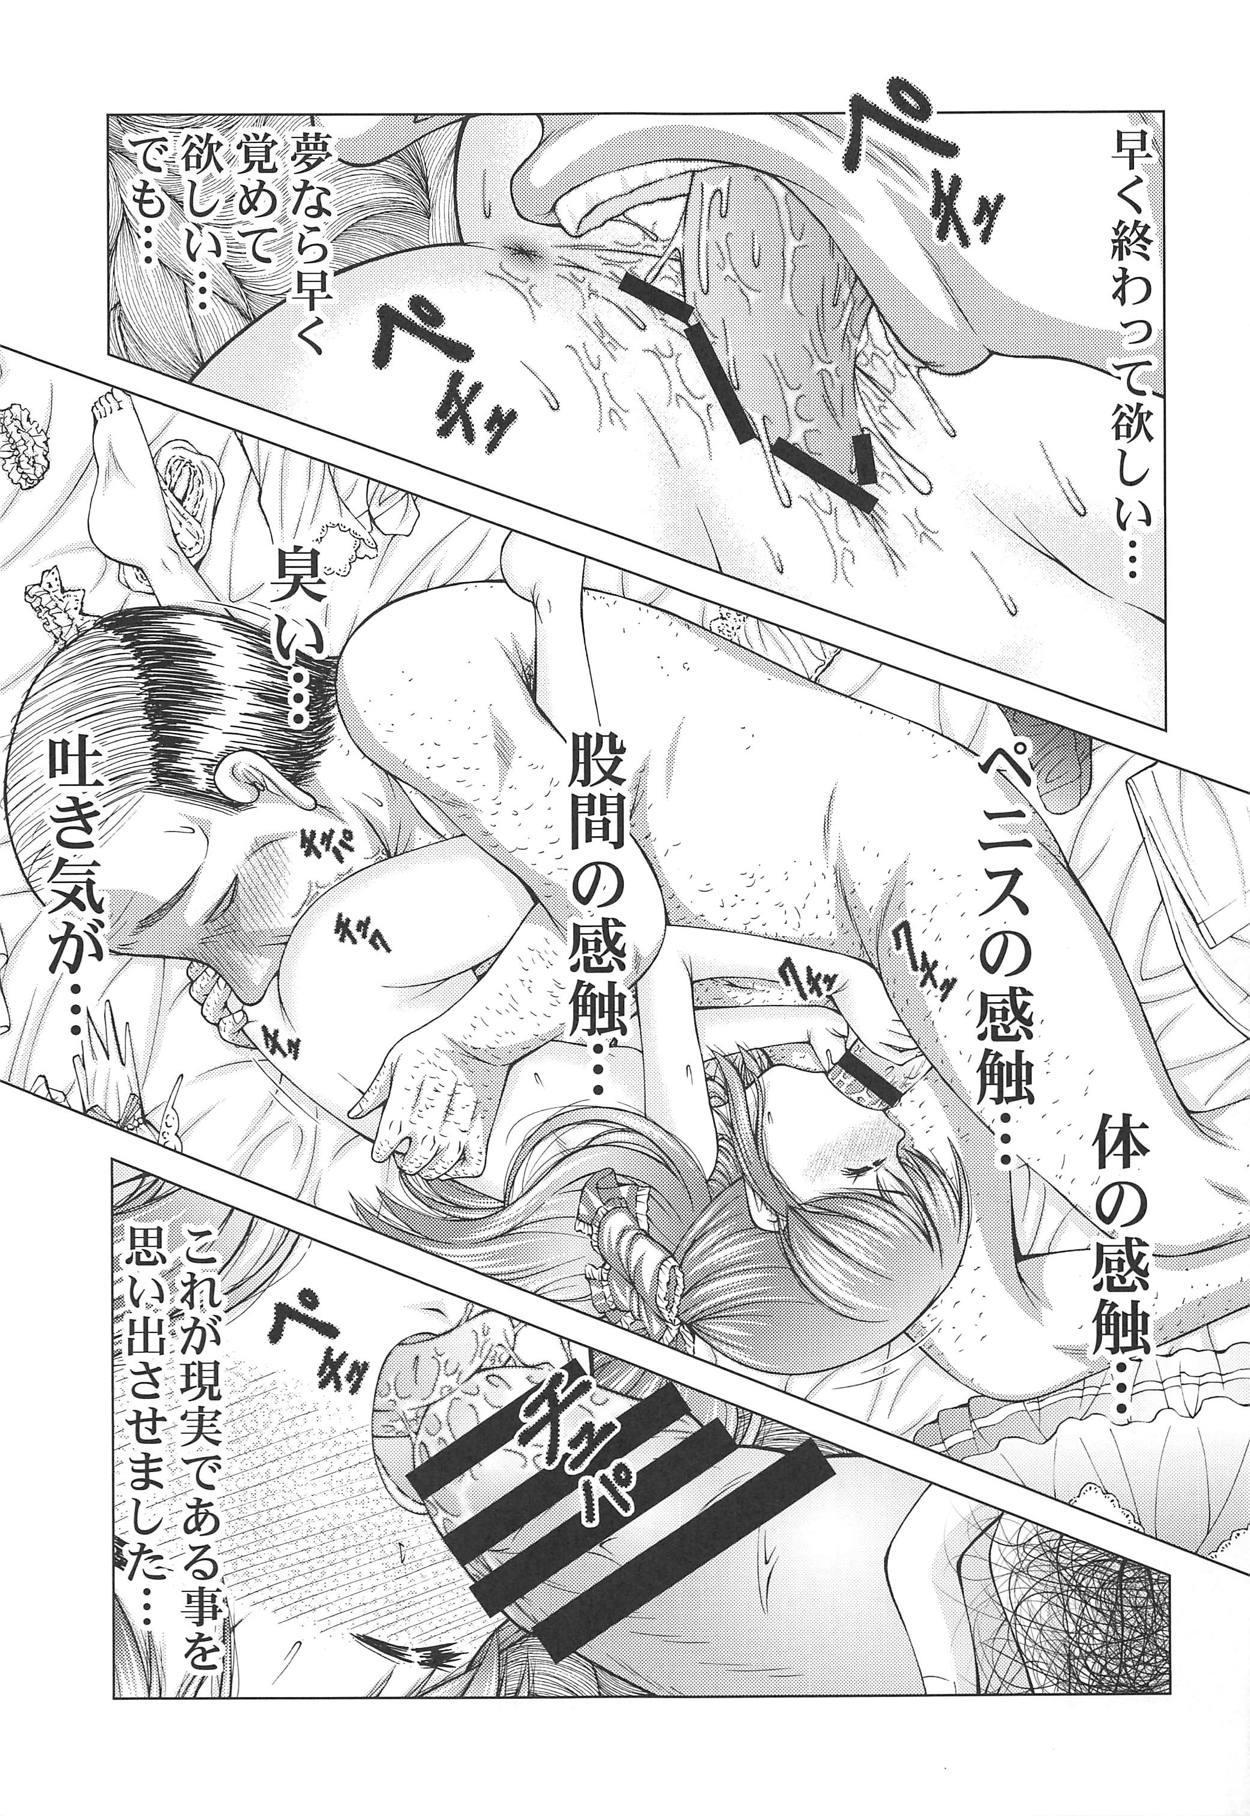 SCOPE! Tokubetsugou Tachibana Arisu Dokusen Interview 17